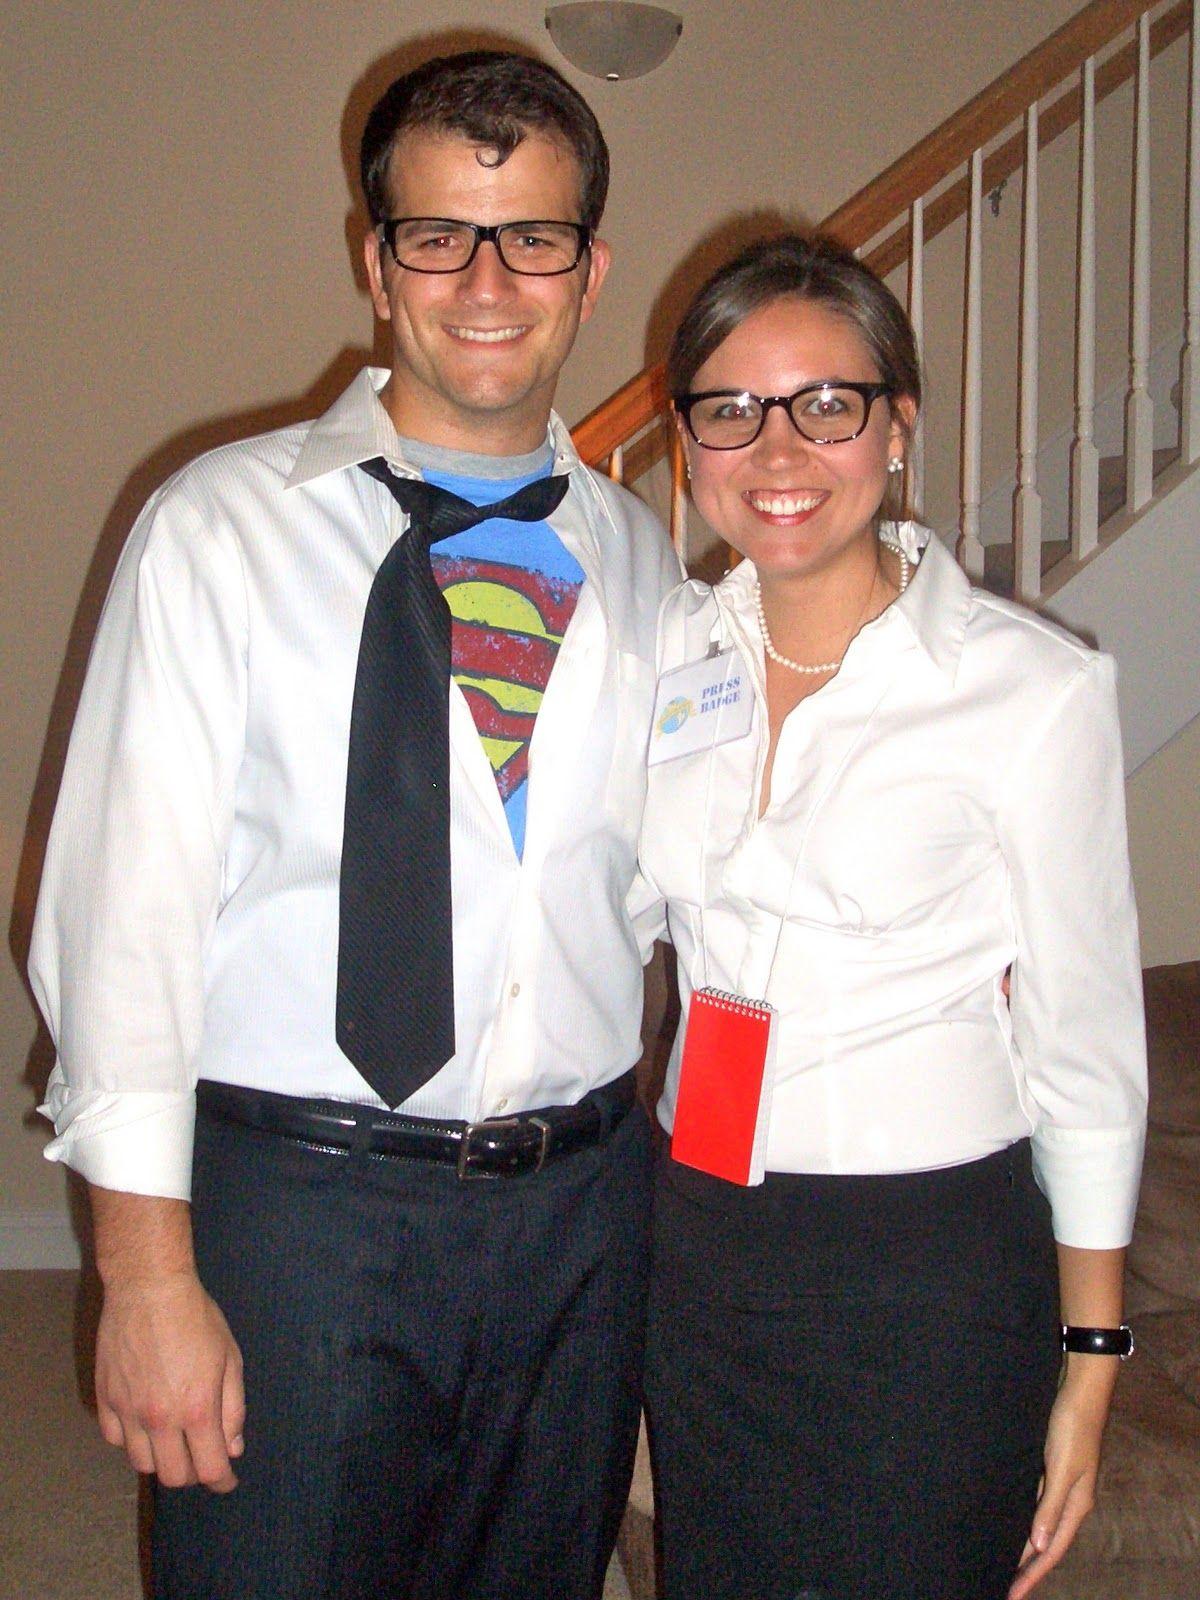 superman and lois lane costume ideas - Google Search  sc 1 st  Pinterest & superman and lois lane costume ideas - Google Search | Creative ...